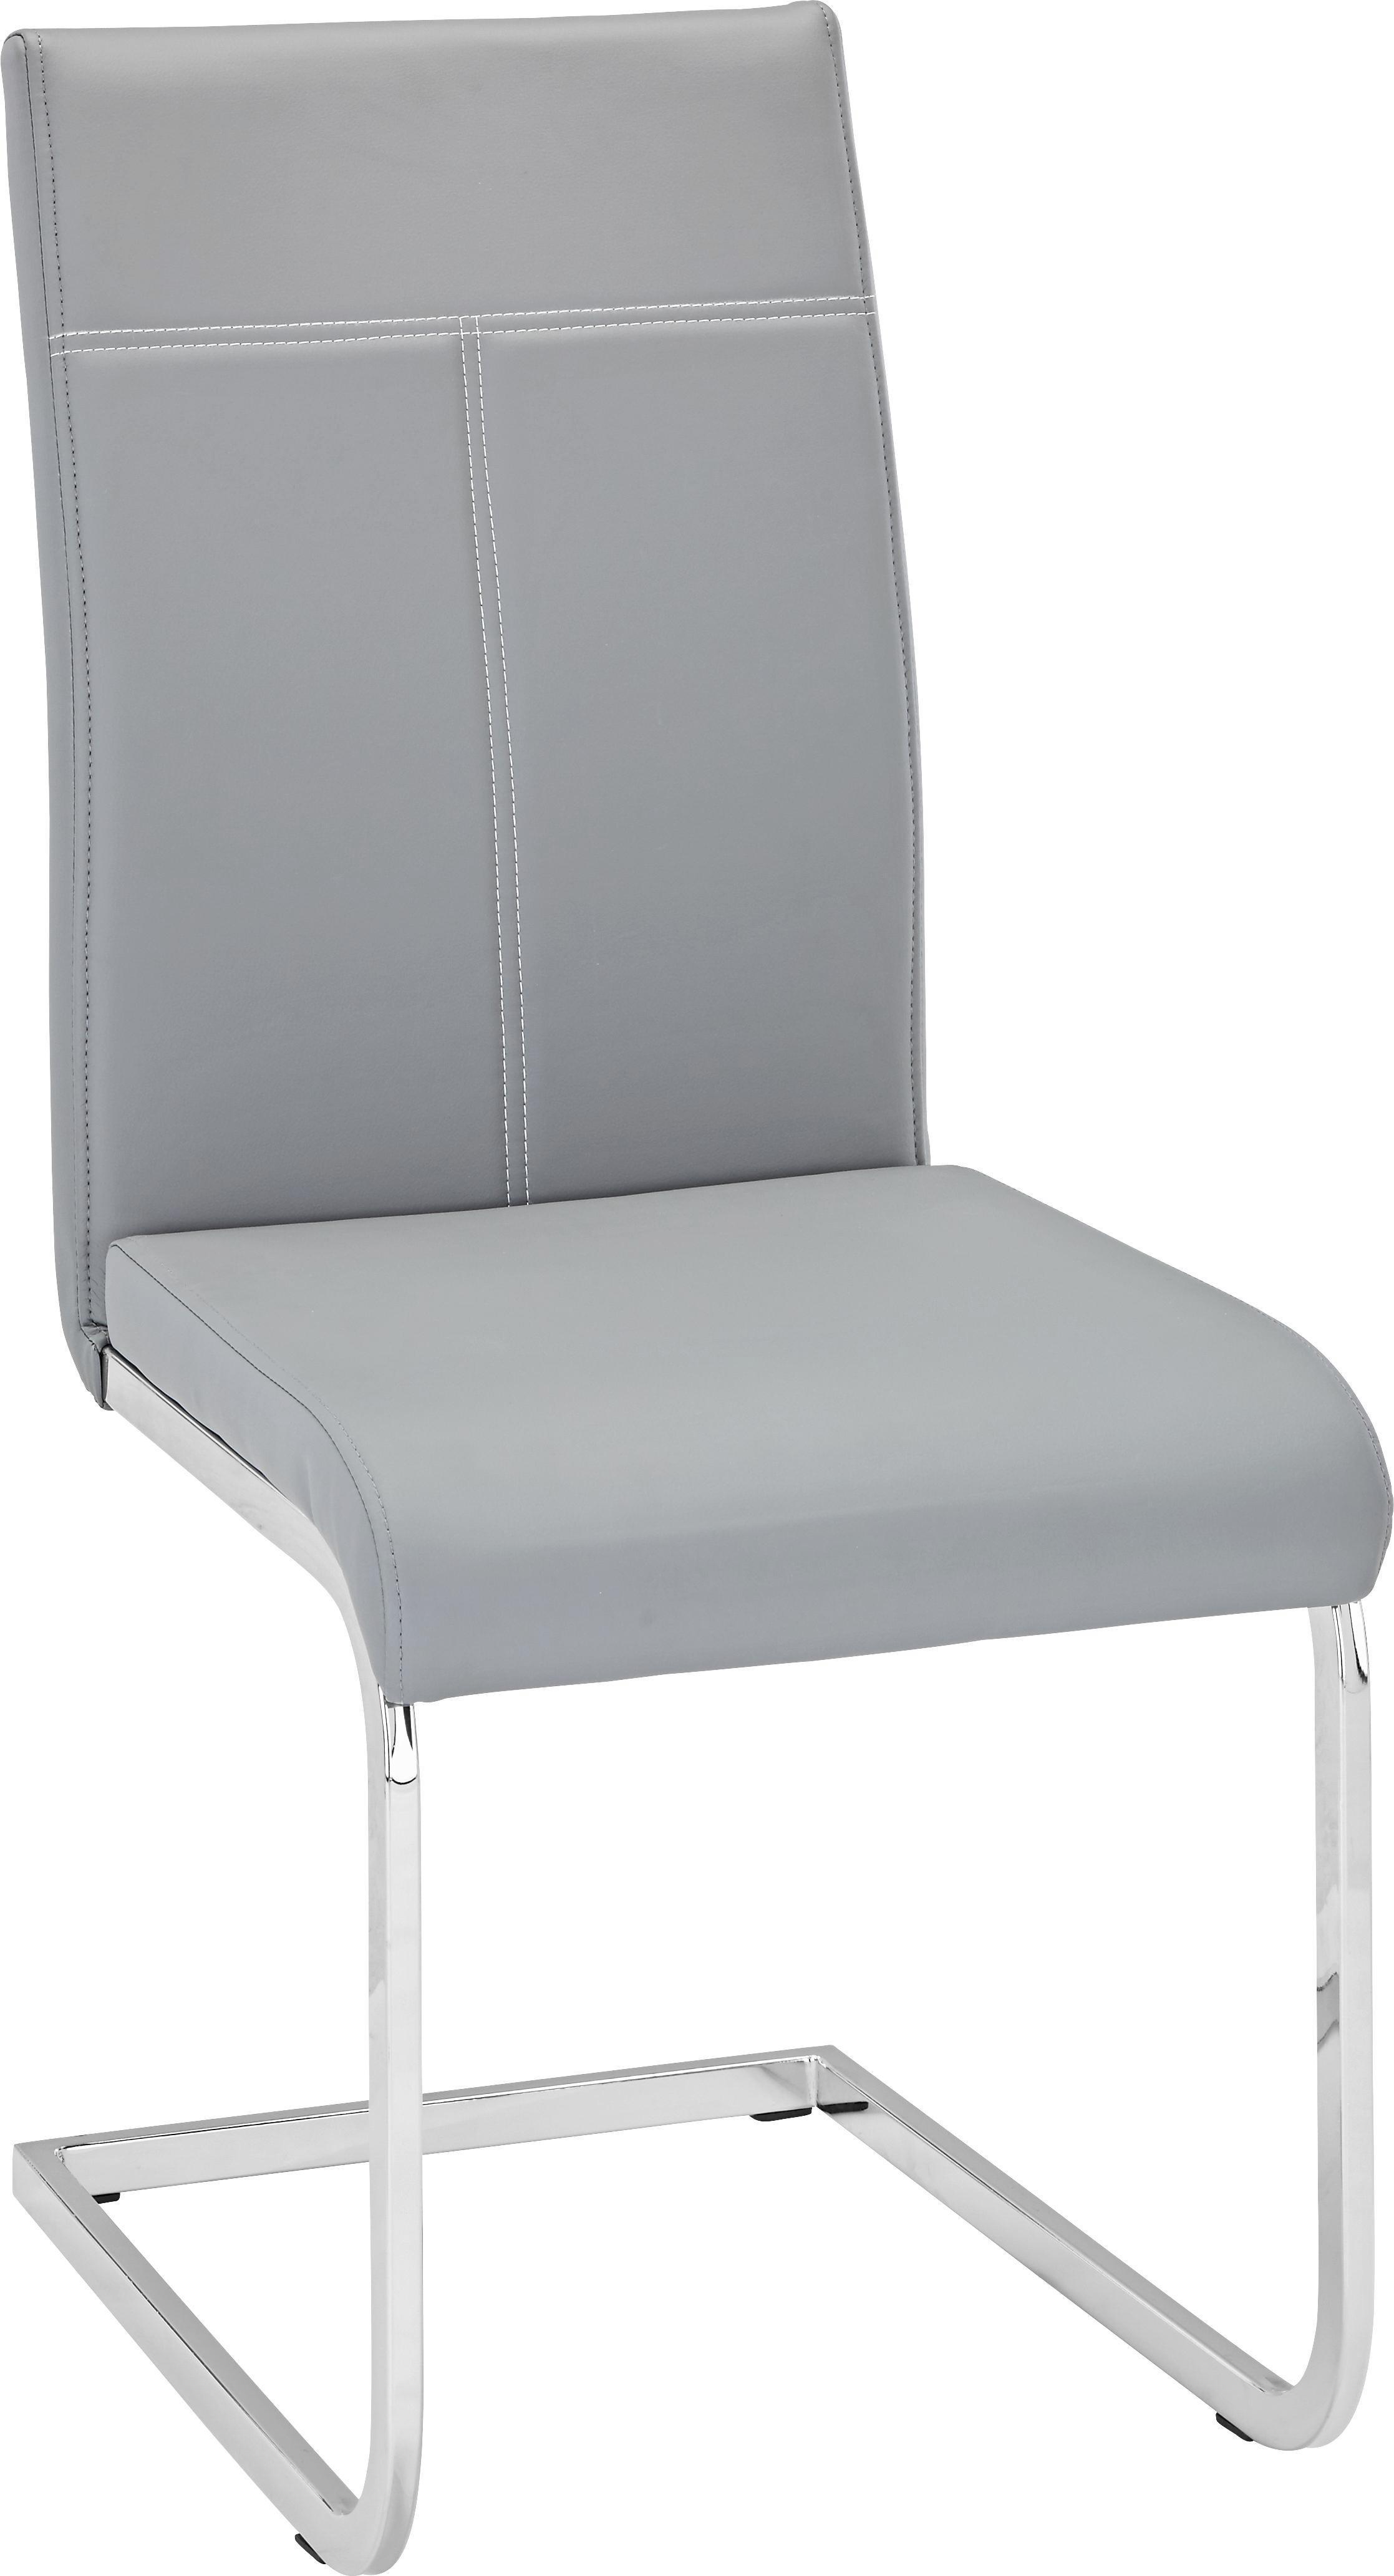 Schwingstuhl in Grau - Chromfarben/Weiß, MODERN, Textil/Metall (44/98/59cm) - MÖMAX modern living